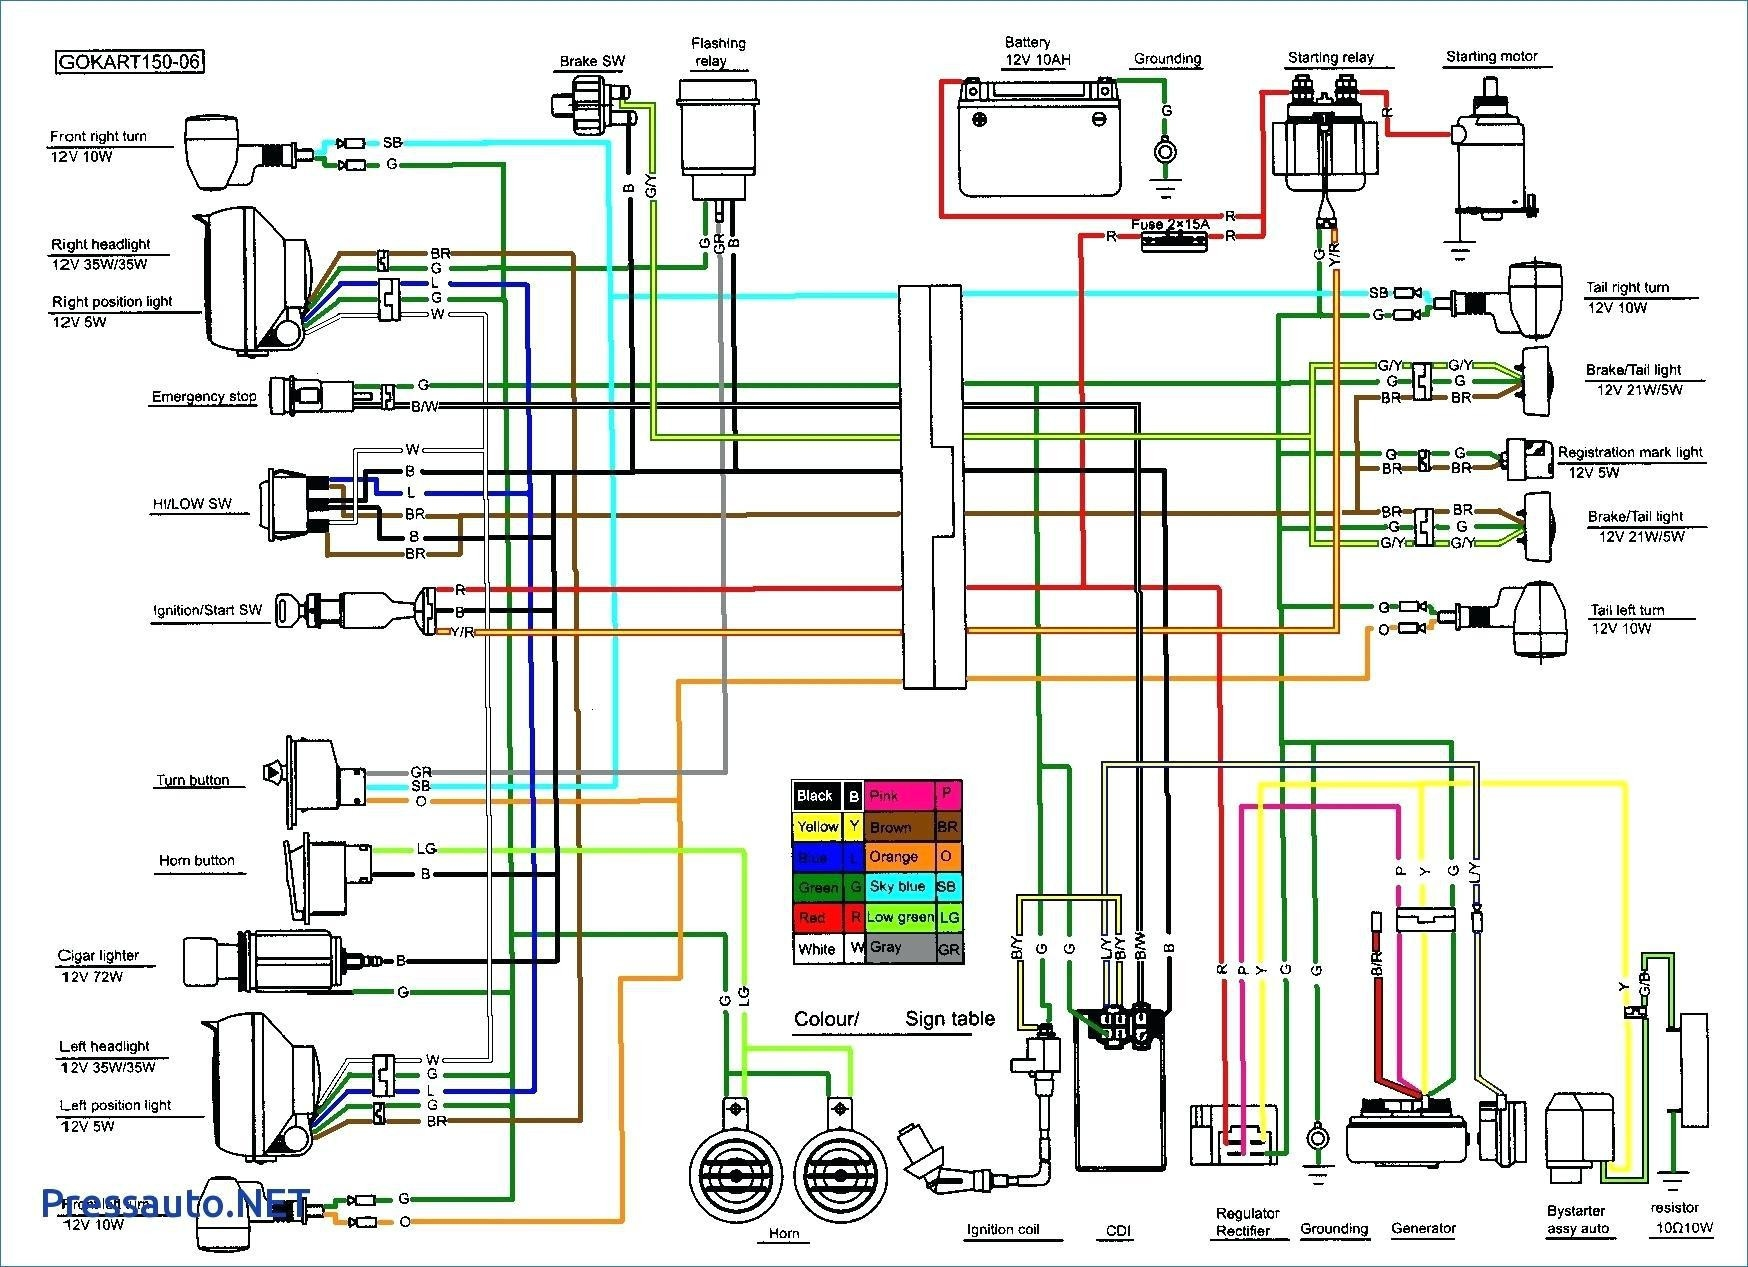 hight resolution of john deere lt wiring schematic wiring diagram john deere lt155 wiring schematic